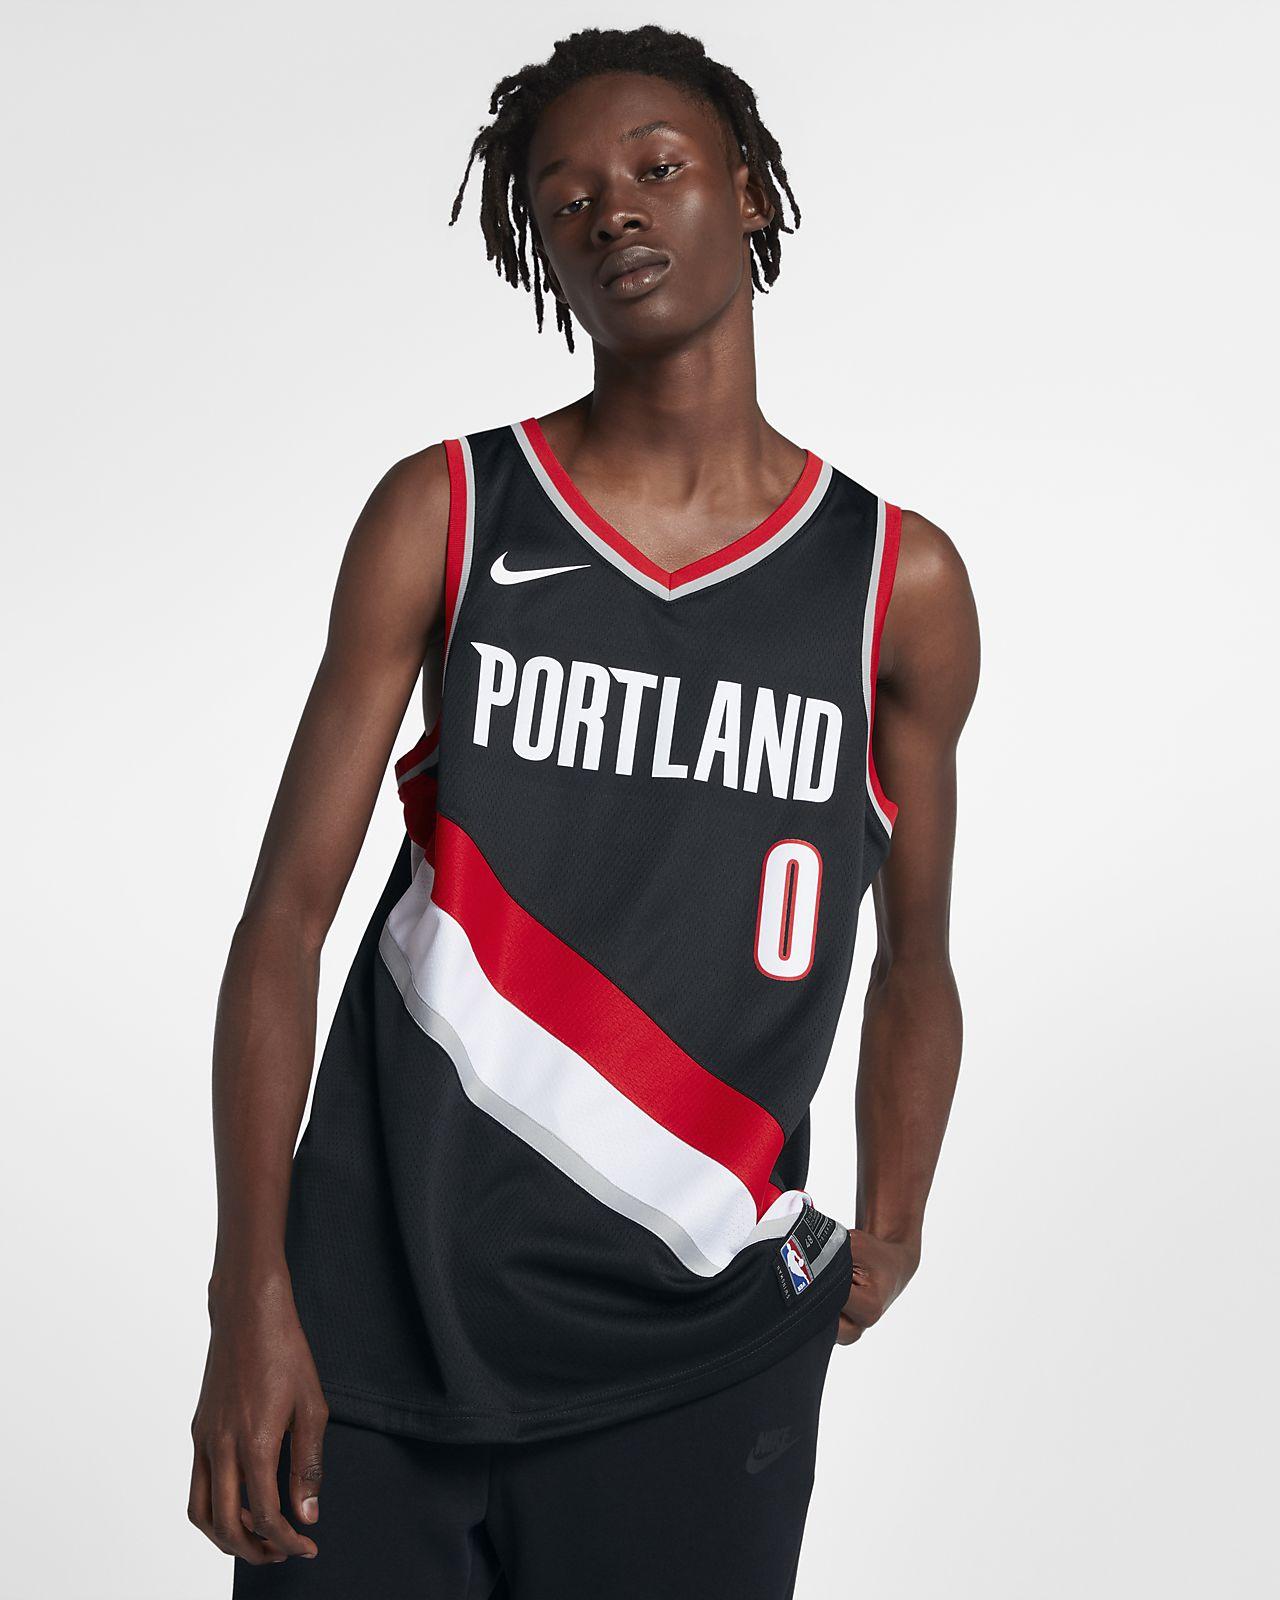 波特兰开拓者队 (Damian Lillard) Icon Edition Nike NBA Swingman Jersey 男子球衣